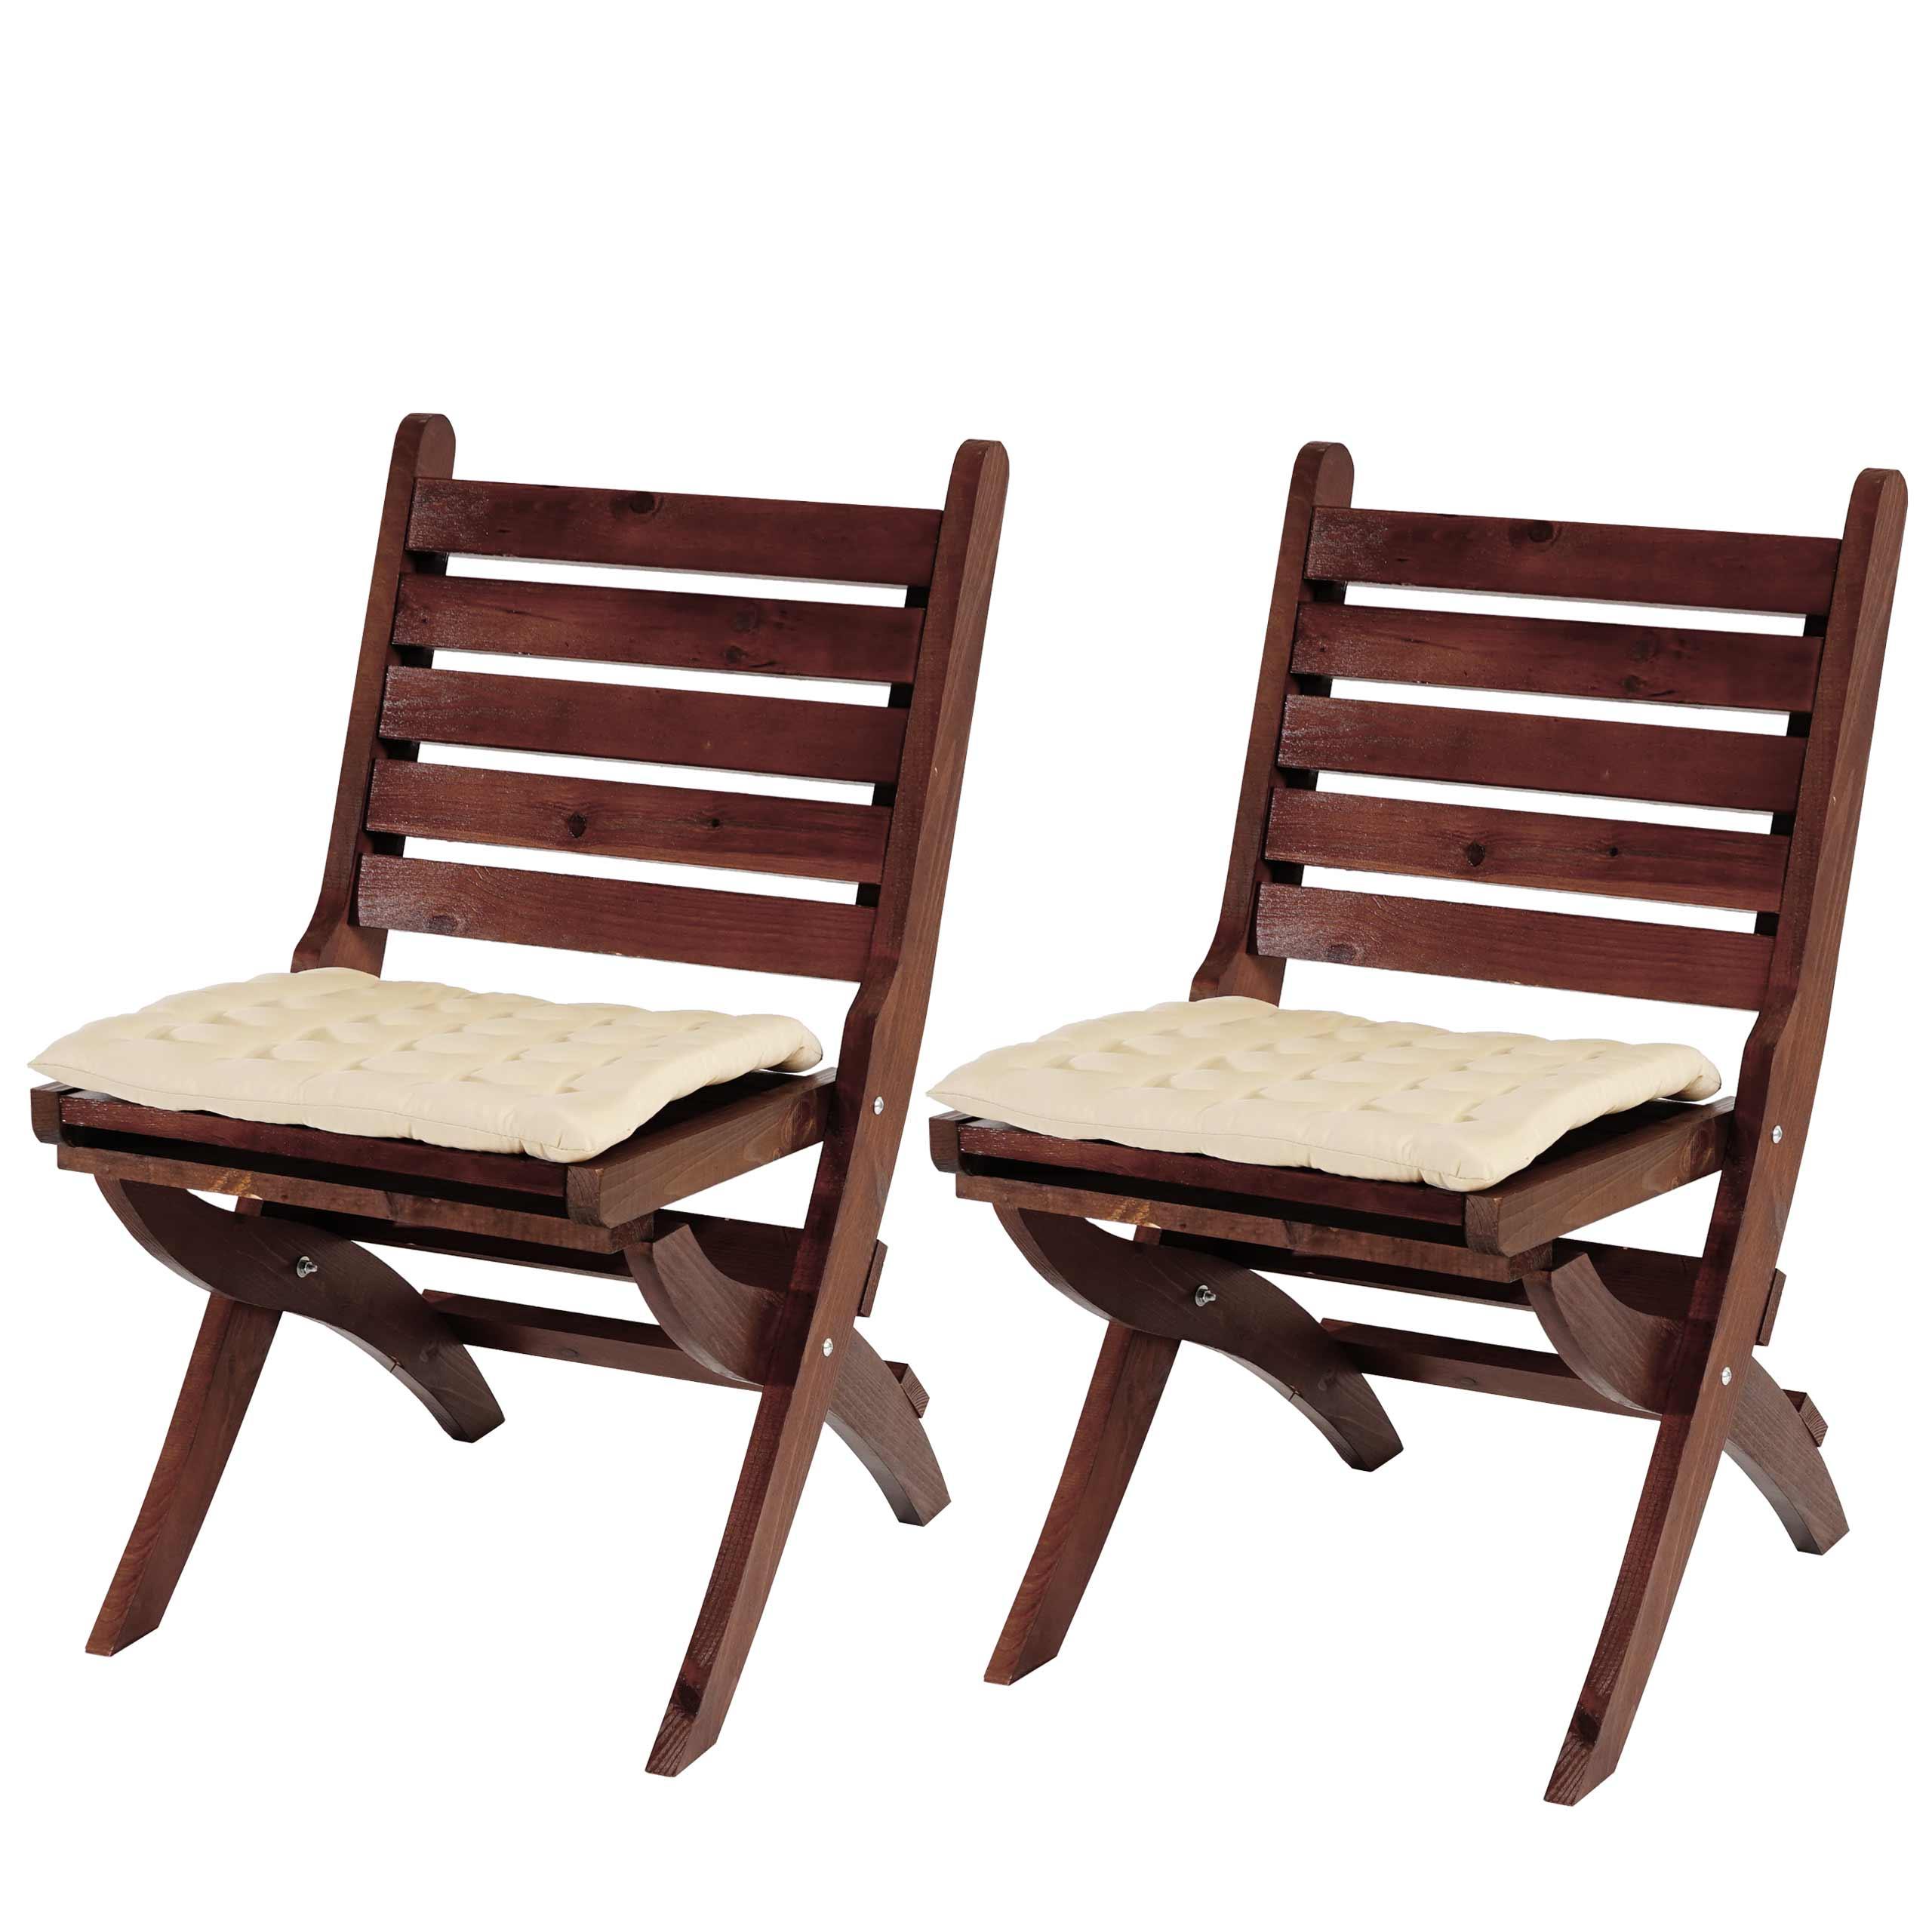 2x sitzkissen canberra stuhlkissen kissen 43x41x3cm. Black Bedroom Furniture Sets. Home Design Ideas